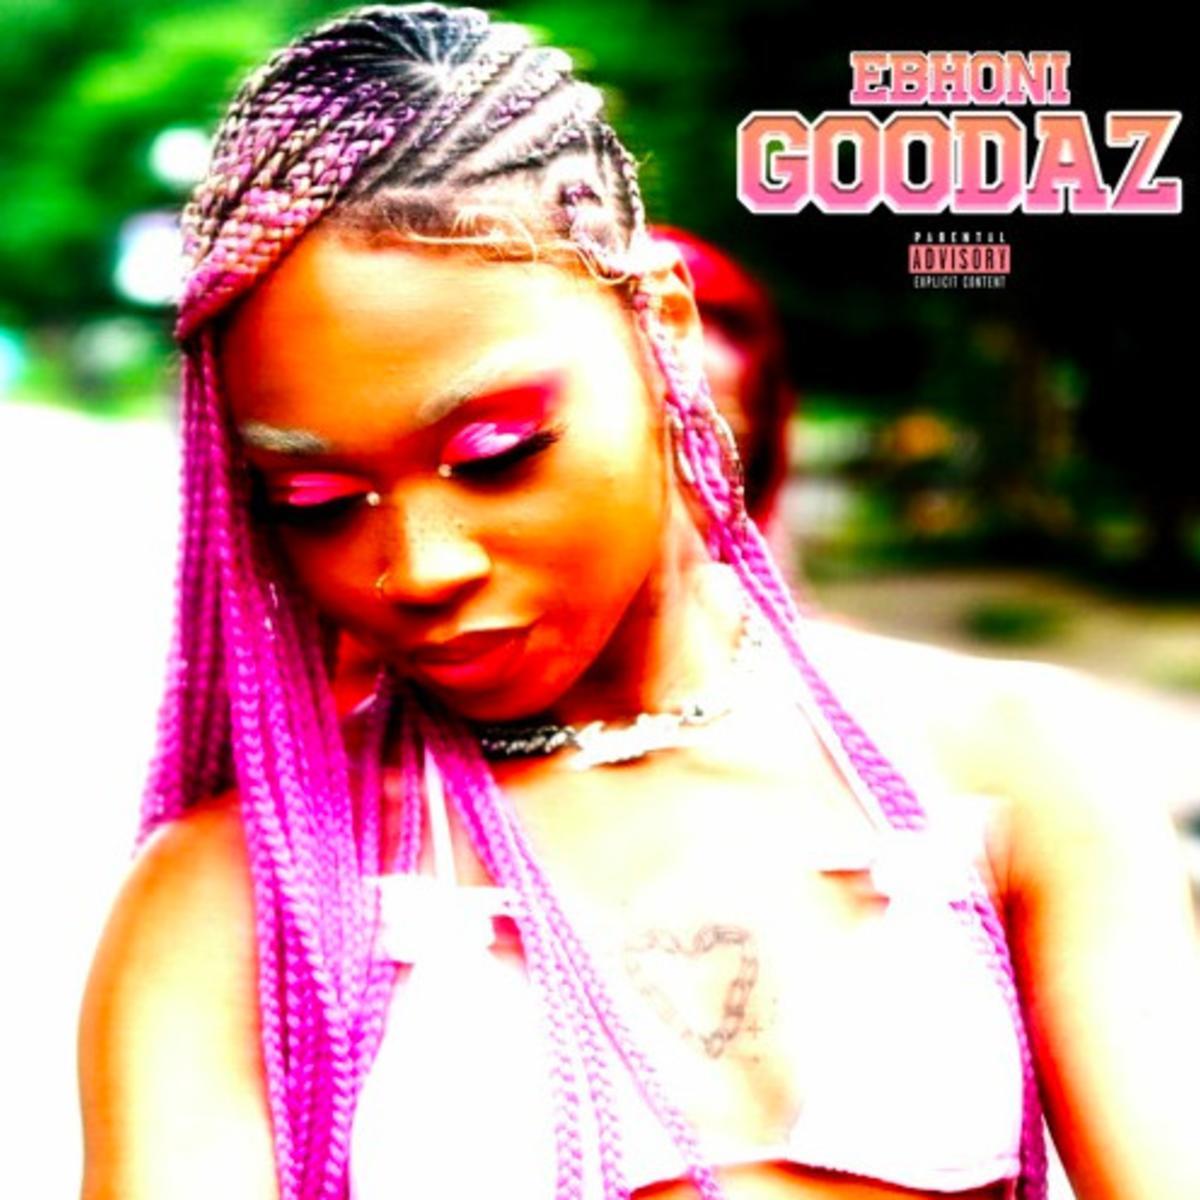 MP3: Ebhoni - Goodaz